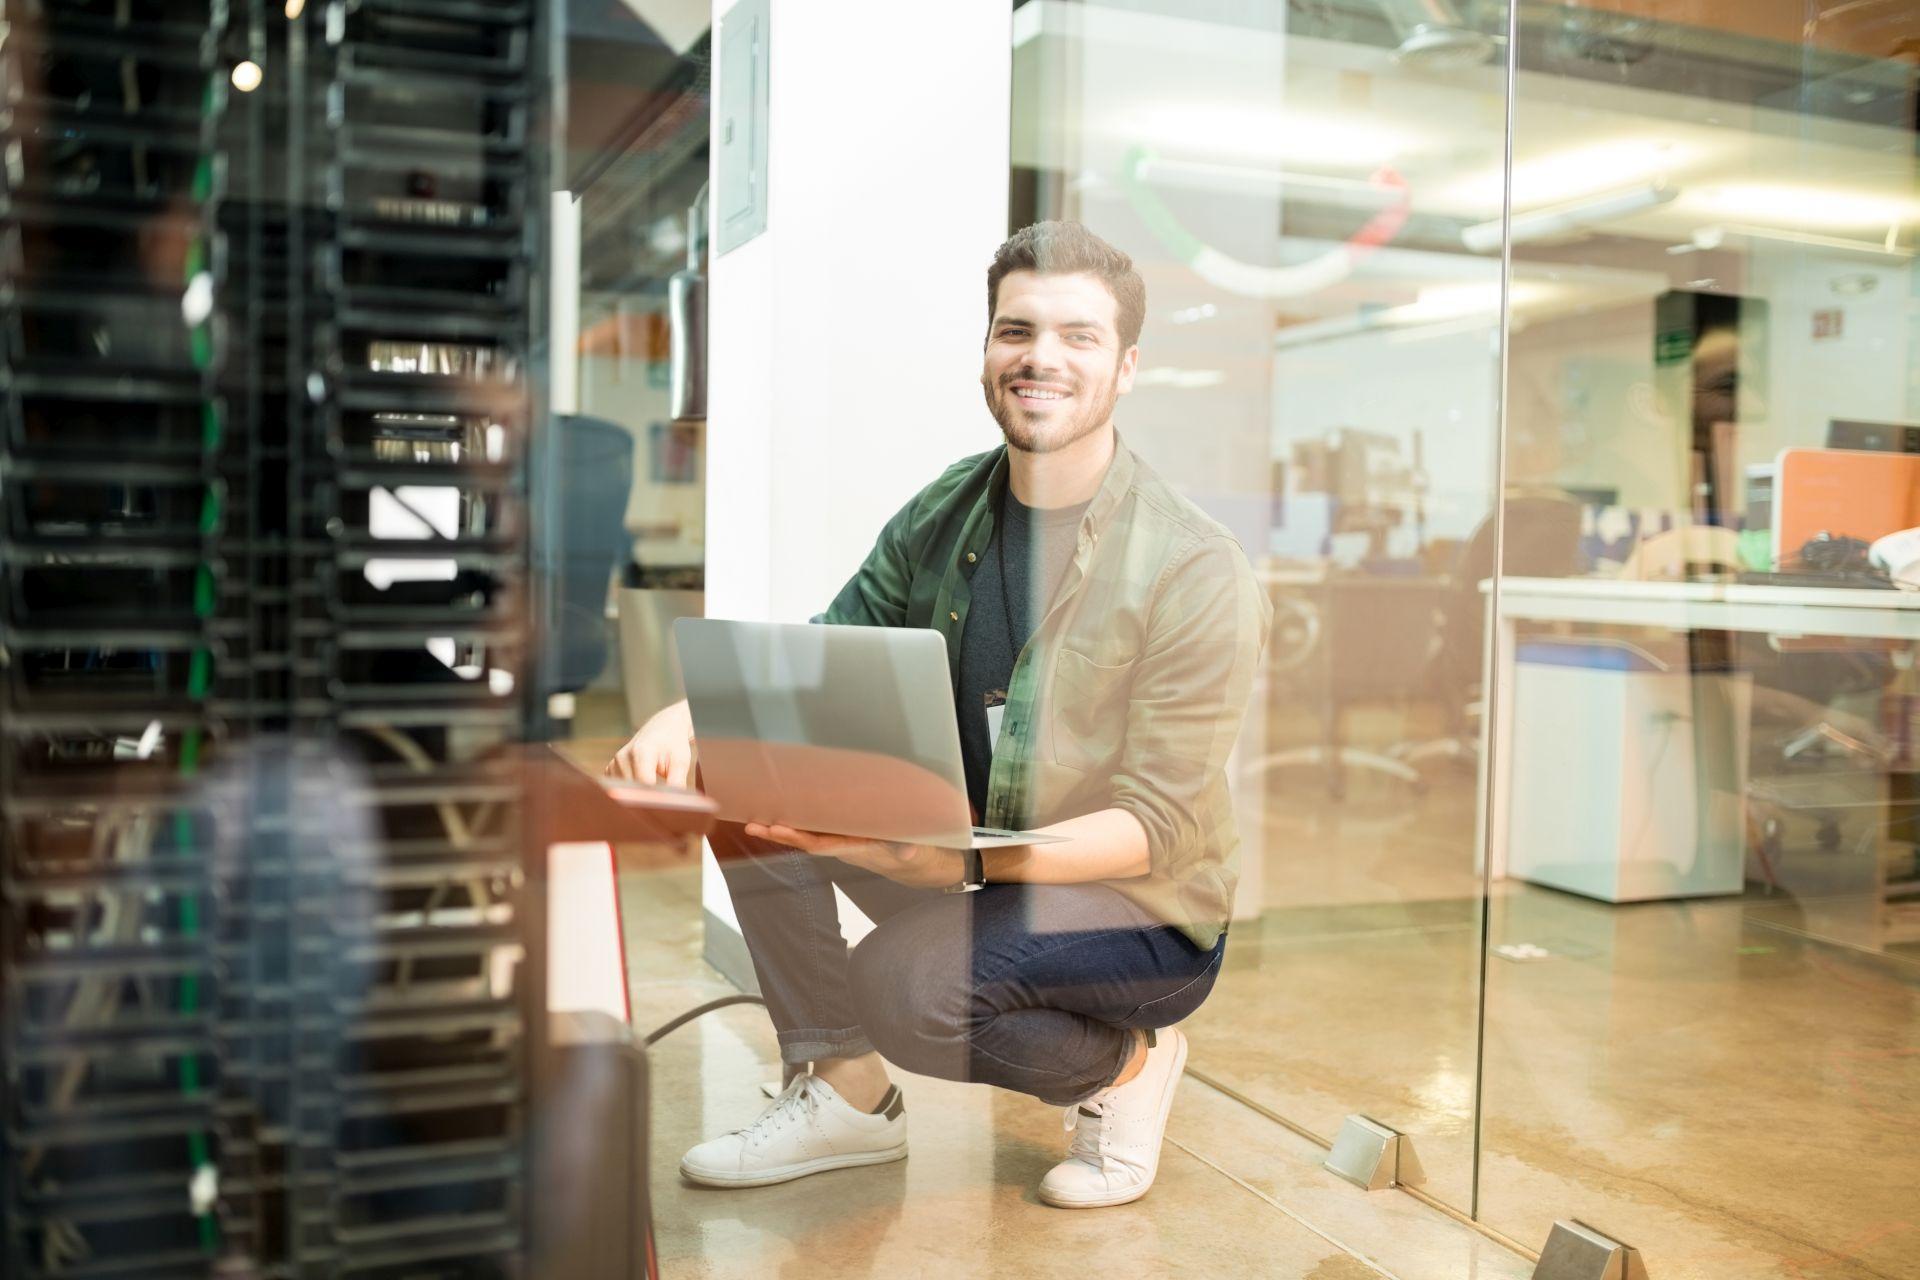 Ausbildung zum Netzwerkadministrator